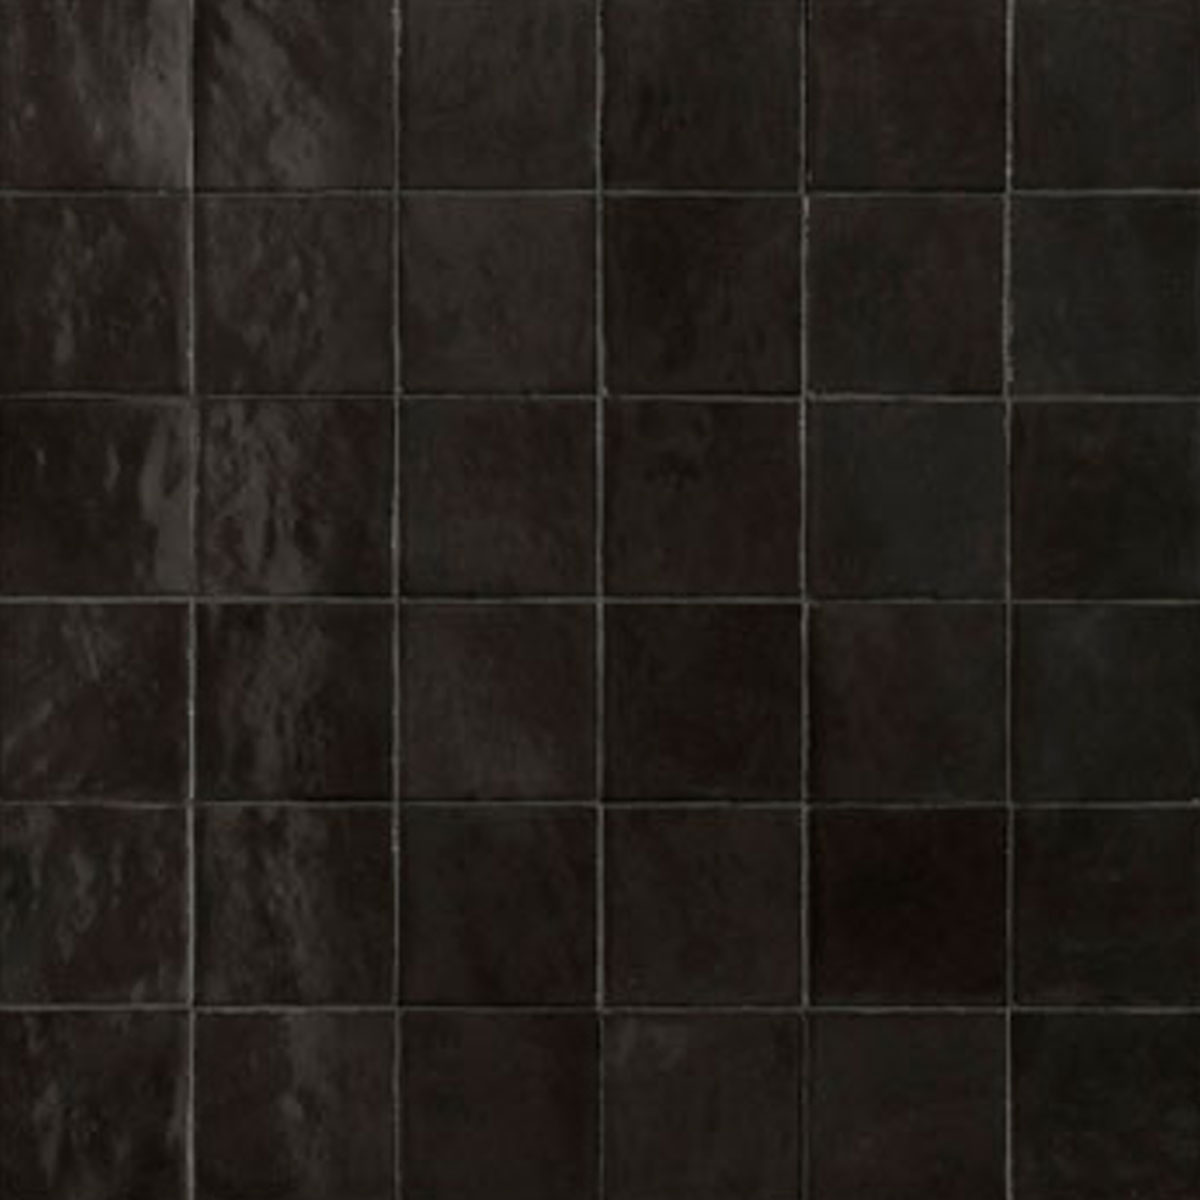 Zellige - Carbone - Handmade Look Tiles - Stone3 Brisbane